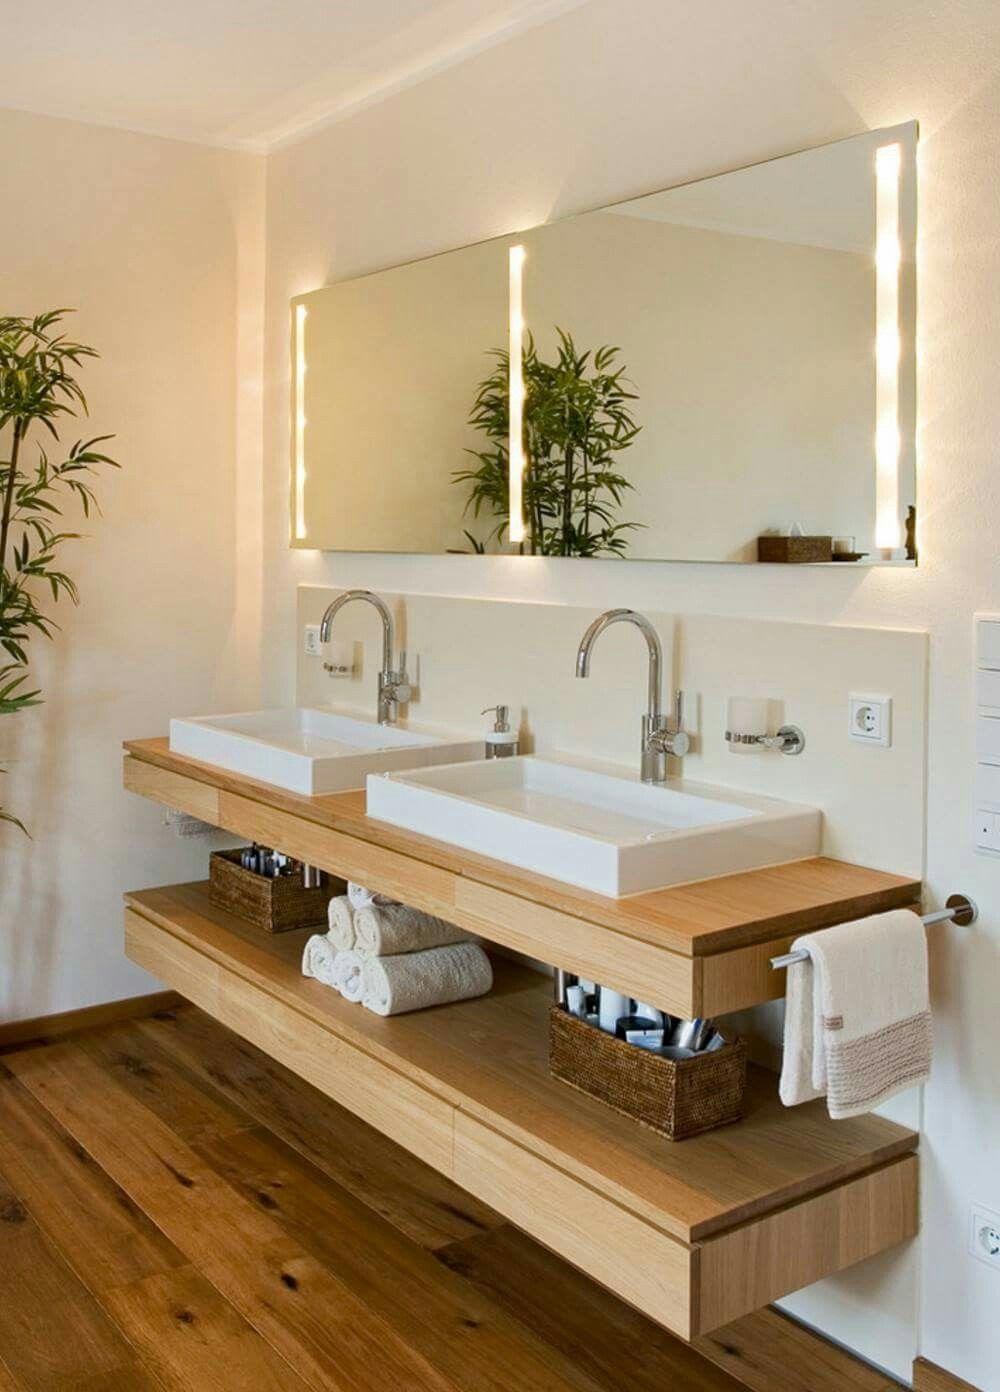 Salle de bain référence Houzz | Salle de bain | Pinterest | Girl ...